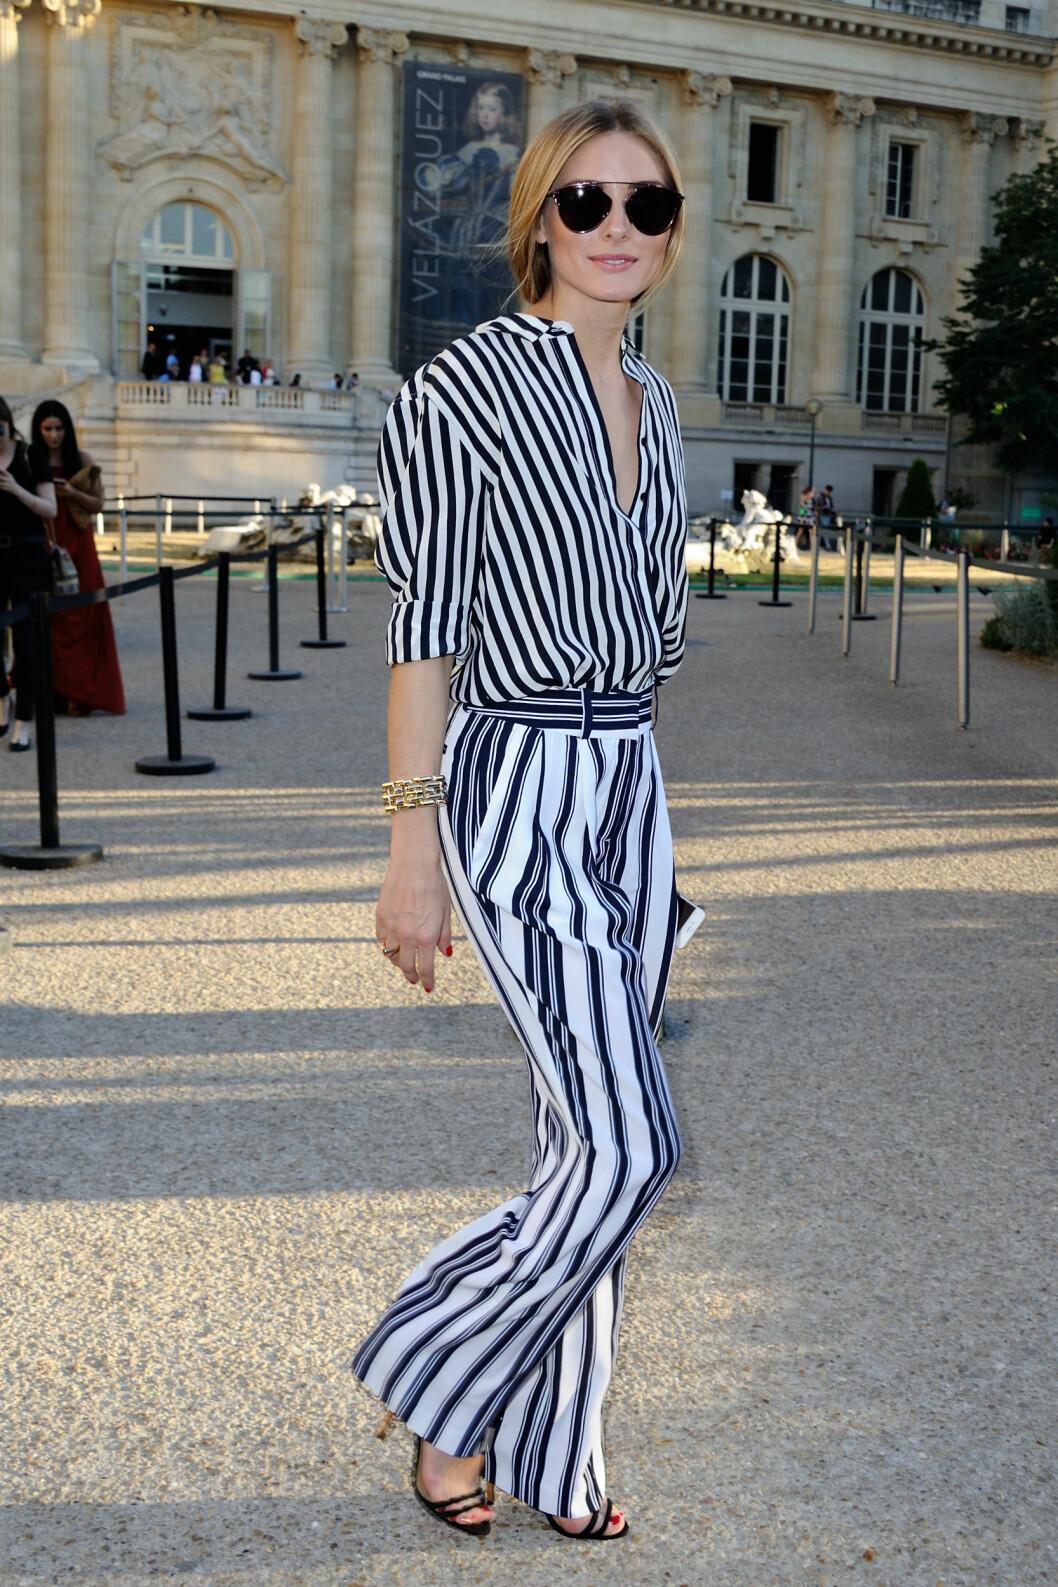 Flotte Olivia Palermo i doble striper. Vi elsker looken! Foto: Scanpix